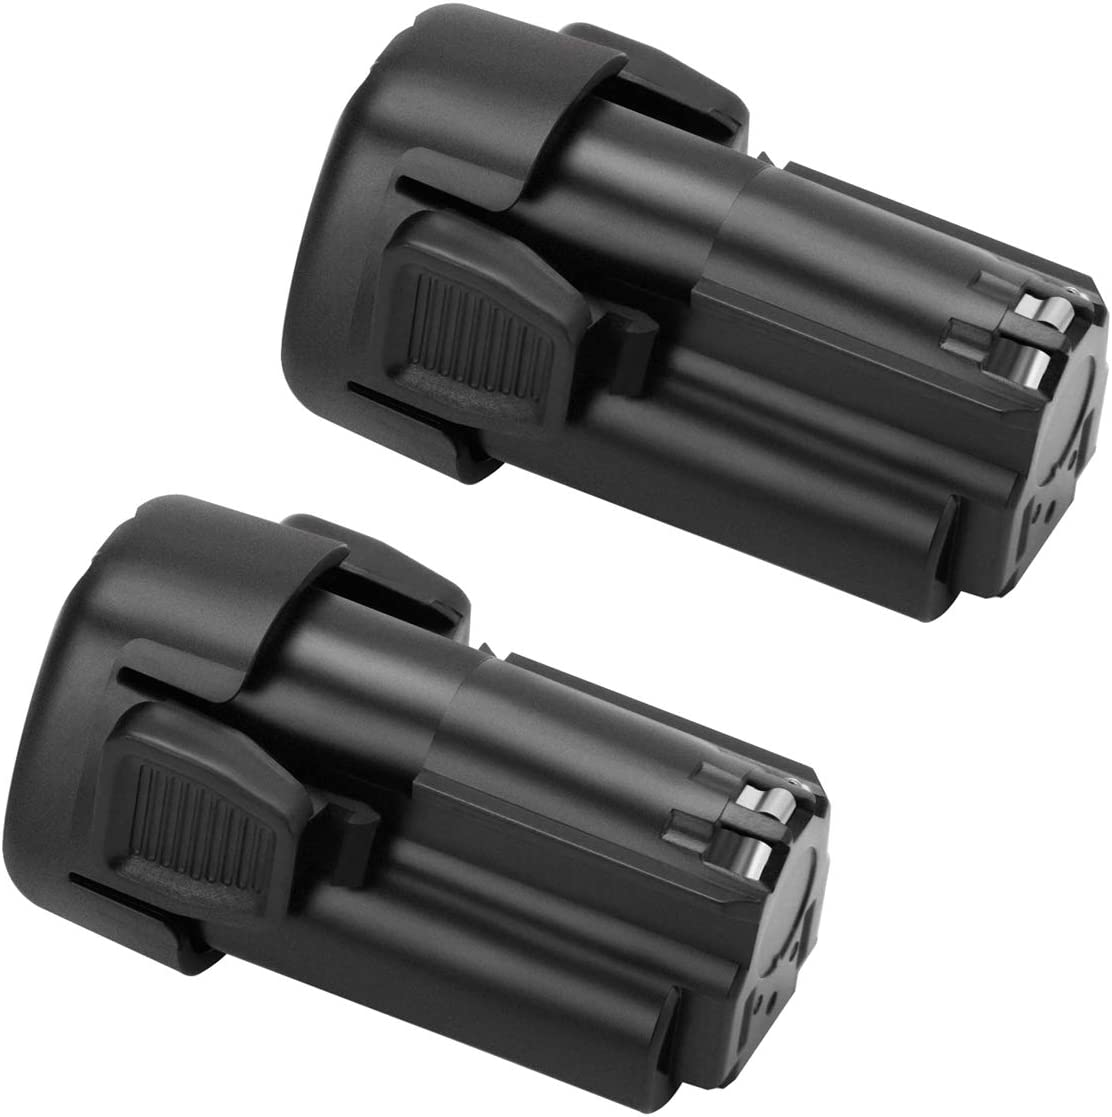 Shentec 2 Pack 3000mAh 12V Lithium Battery Compatible with Black & Decker LBXR12 LBX12 BL1510 BL1310 BL1110 LB12